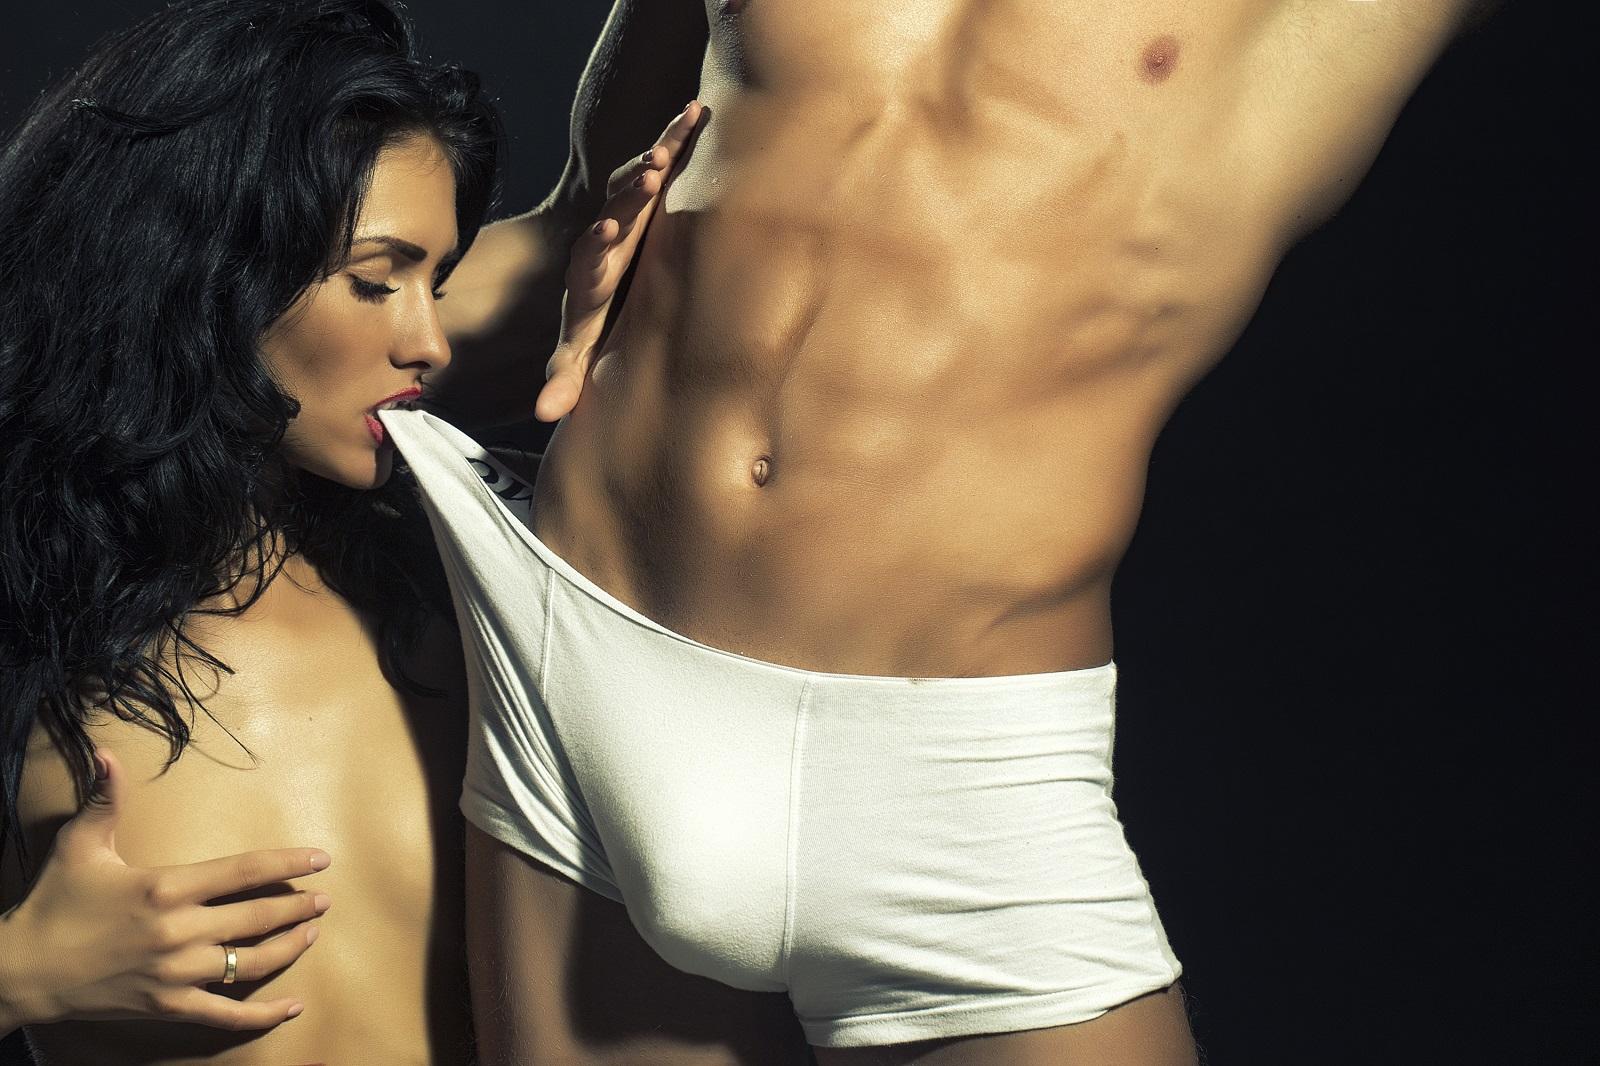 anální sex praxe